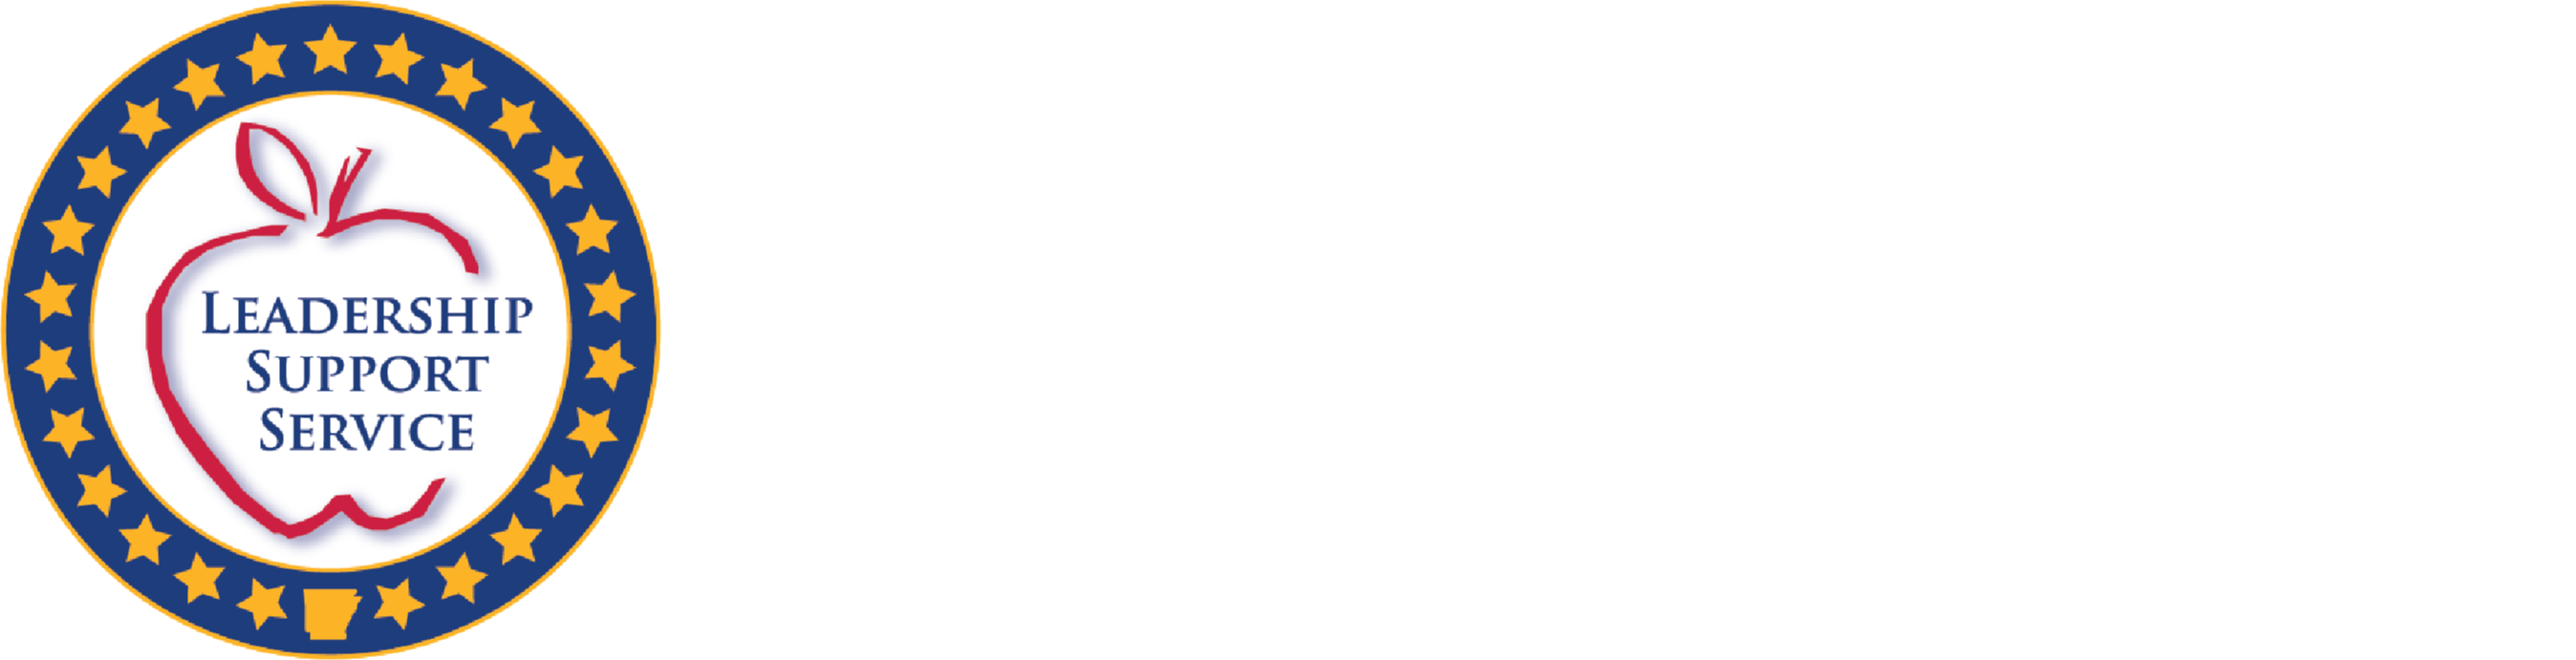 Arkansas Division of Elementary & Secondary Education